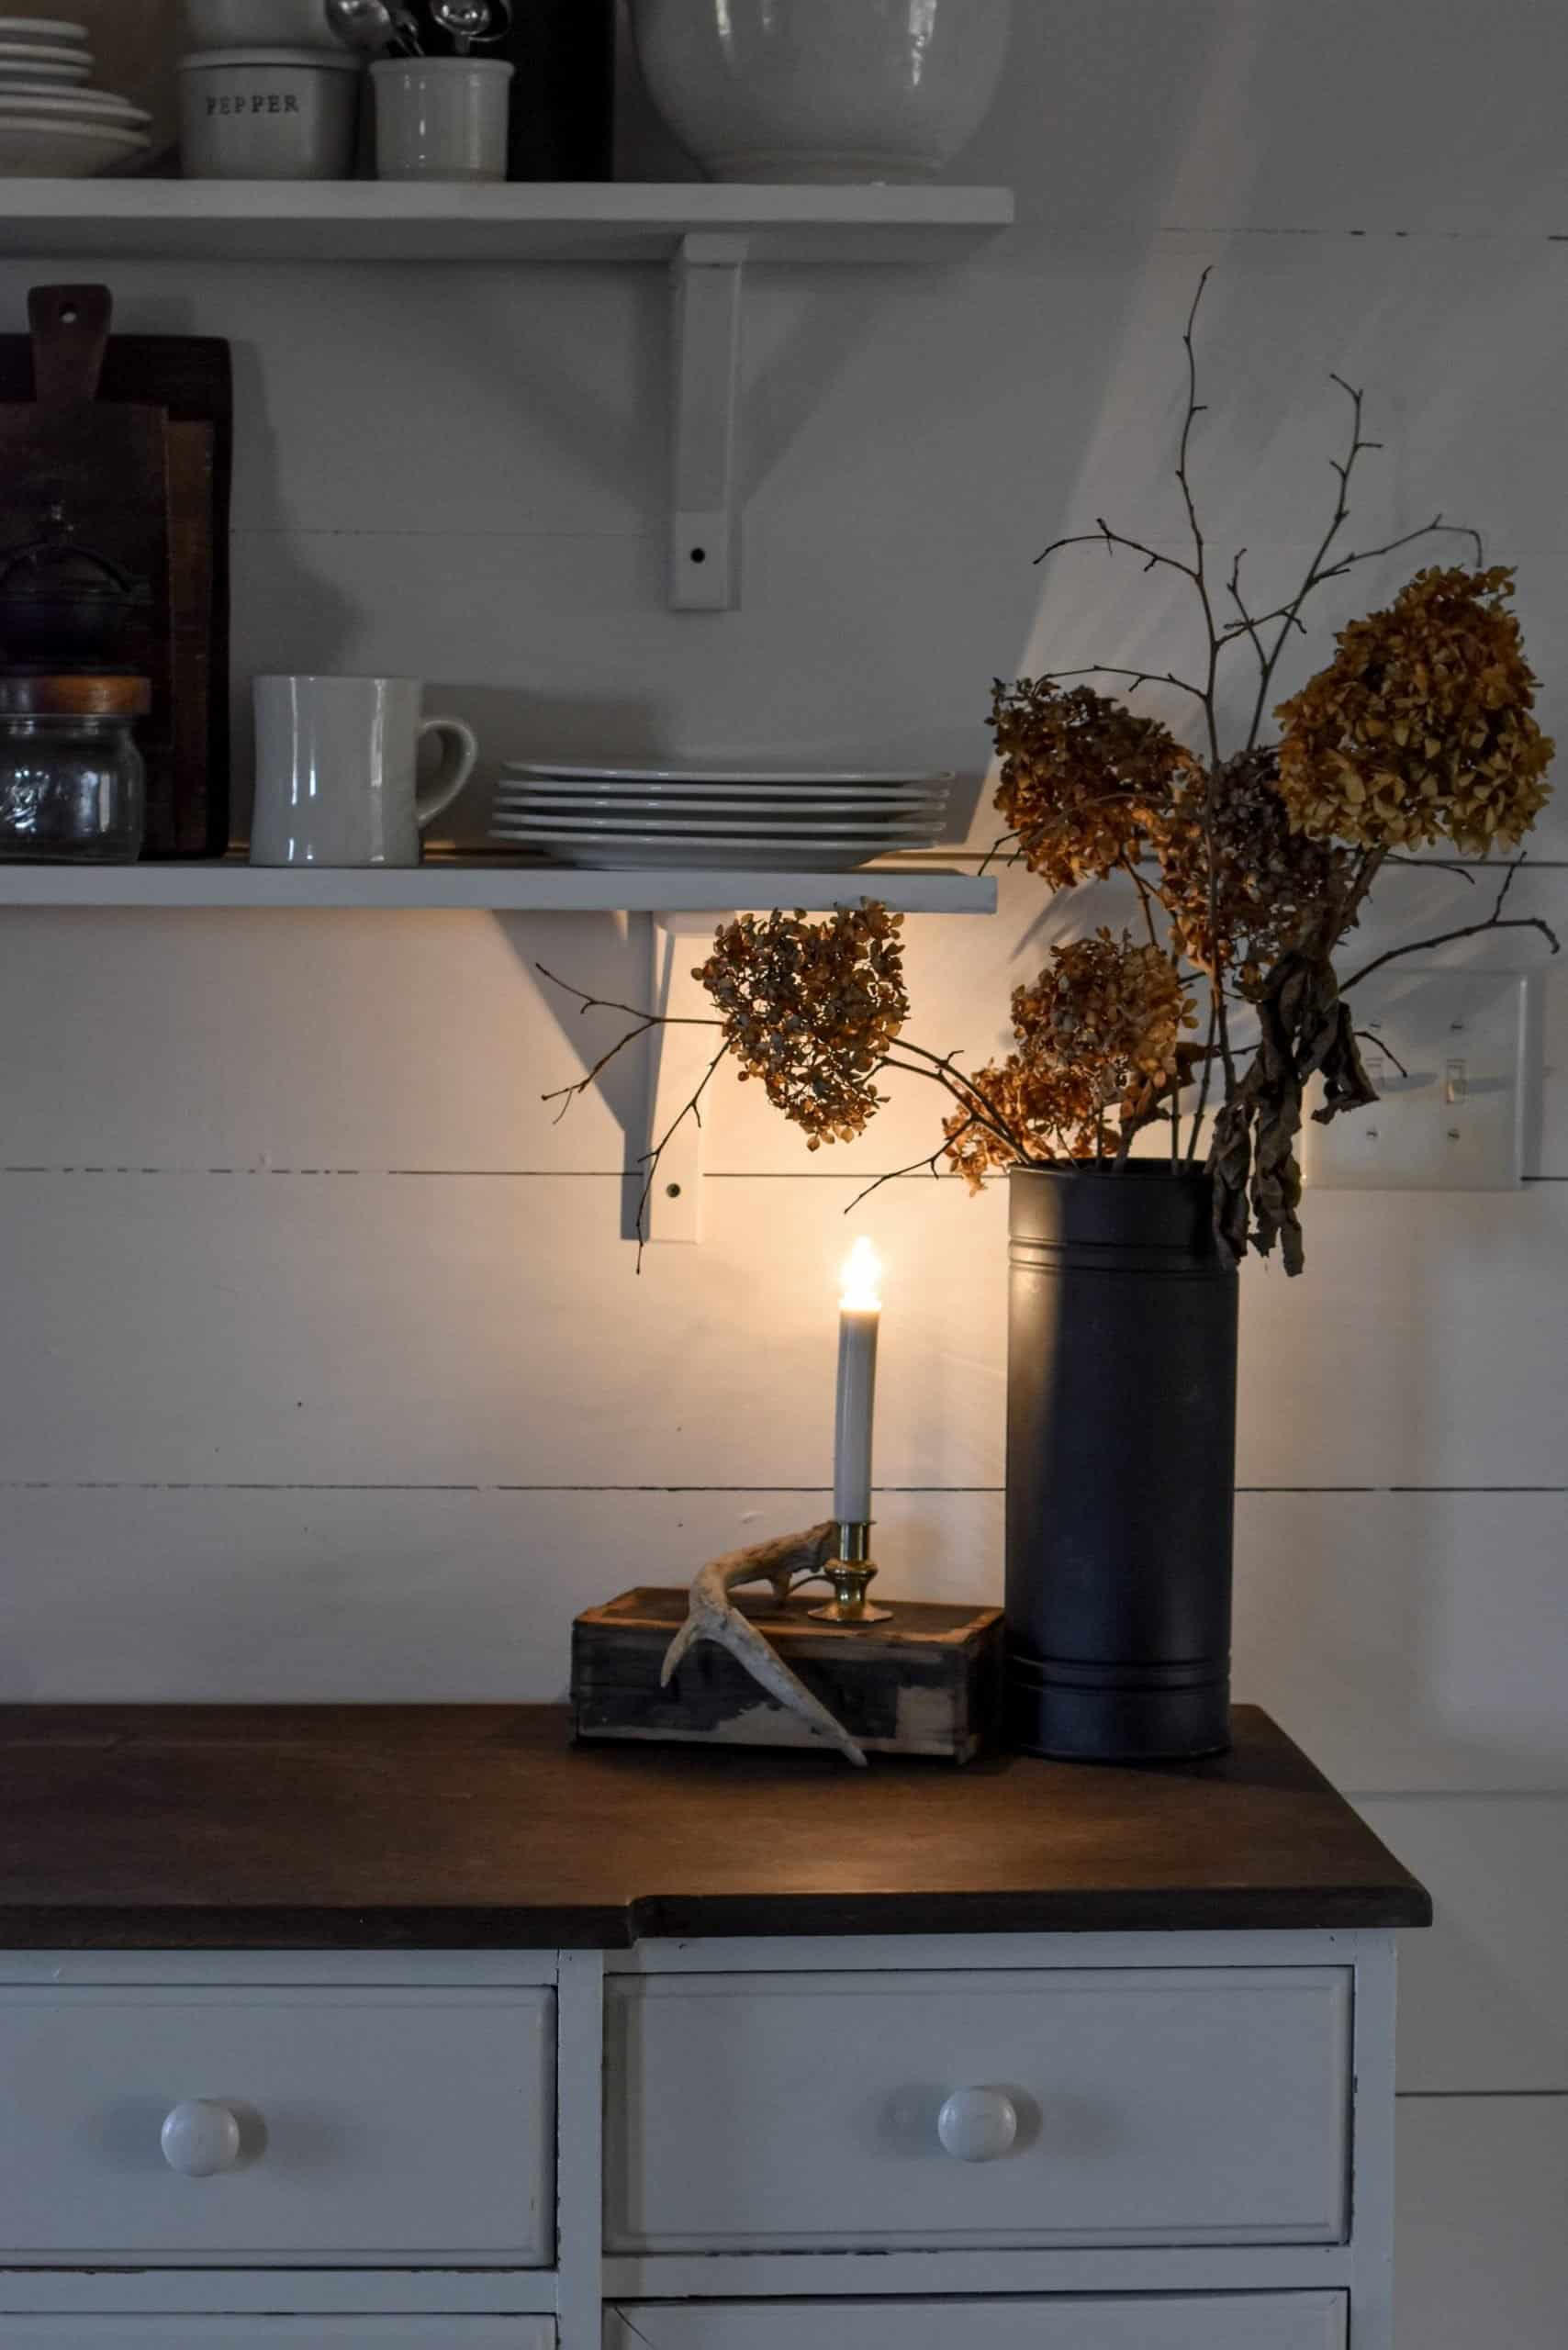 Cozy Fall Kitchen